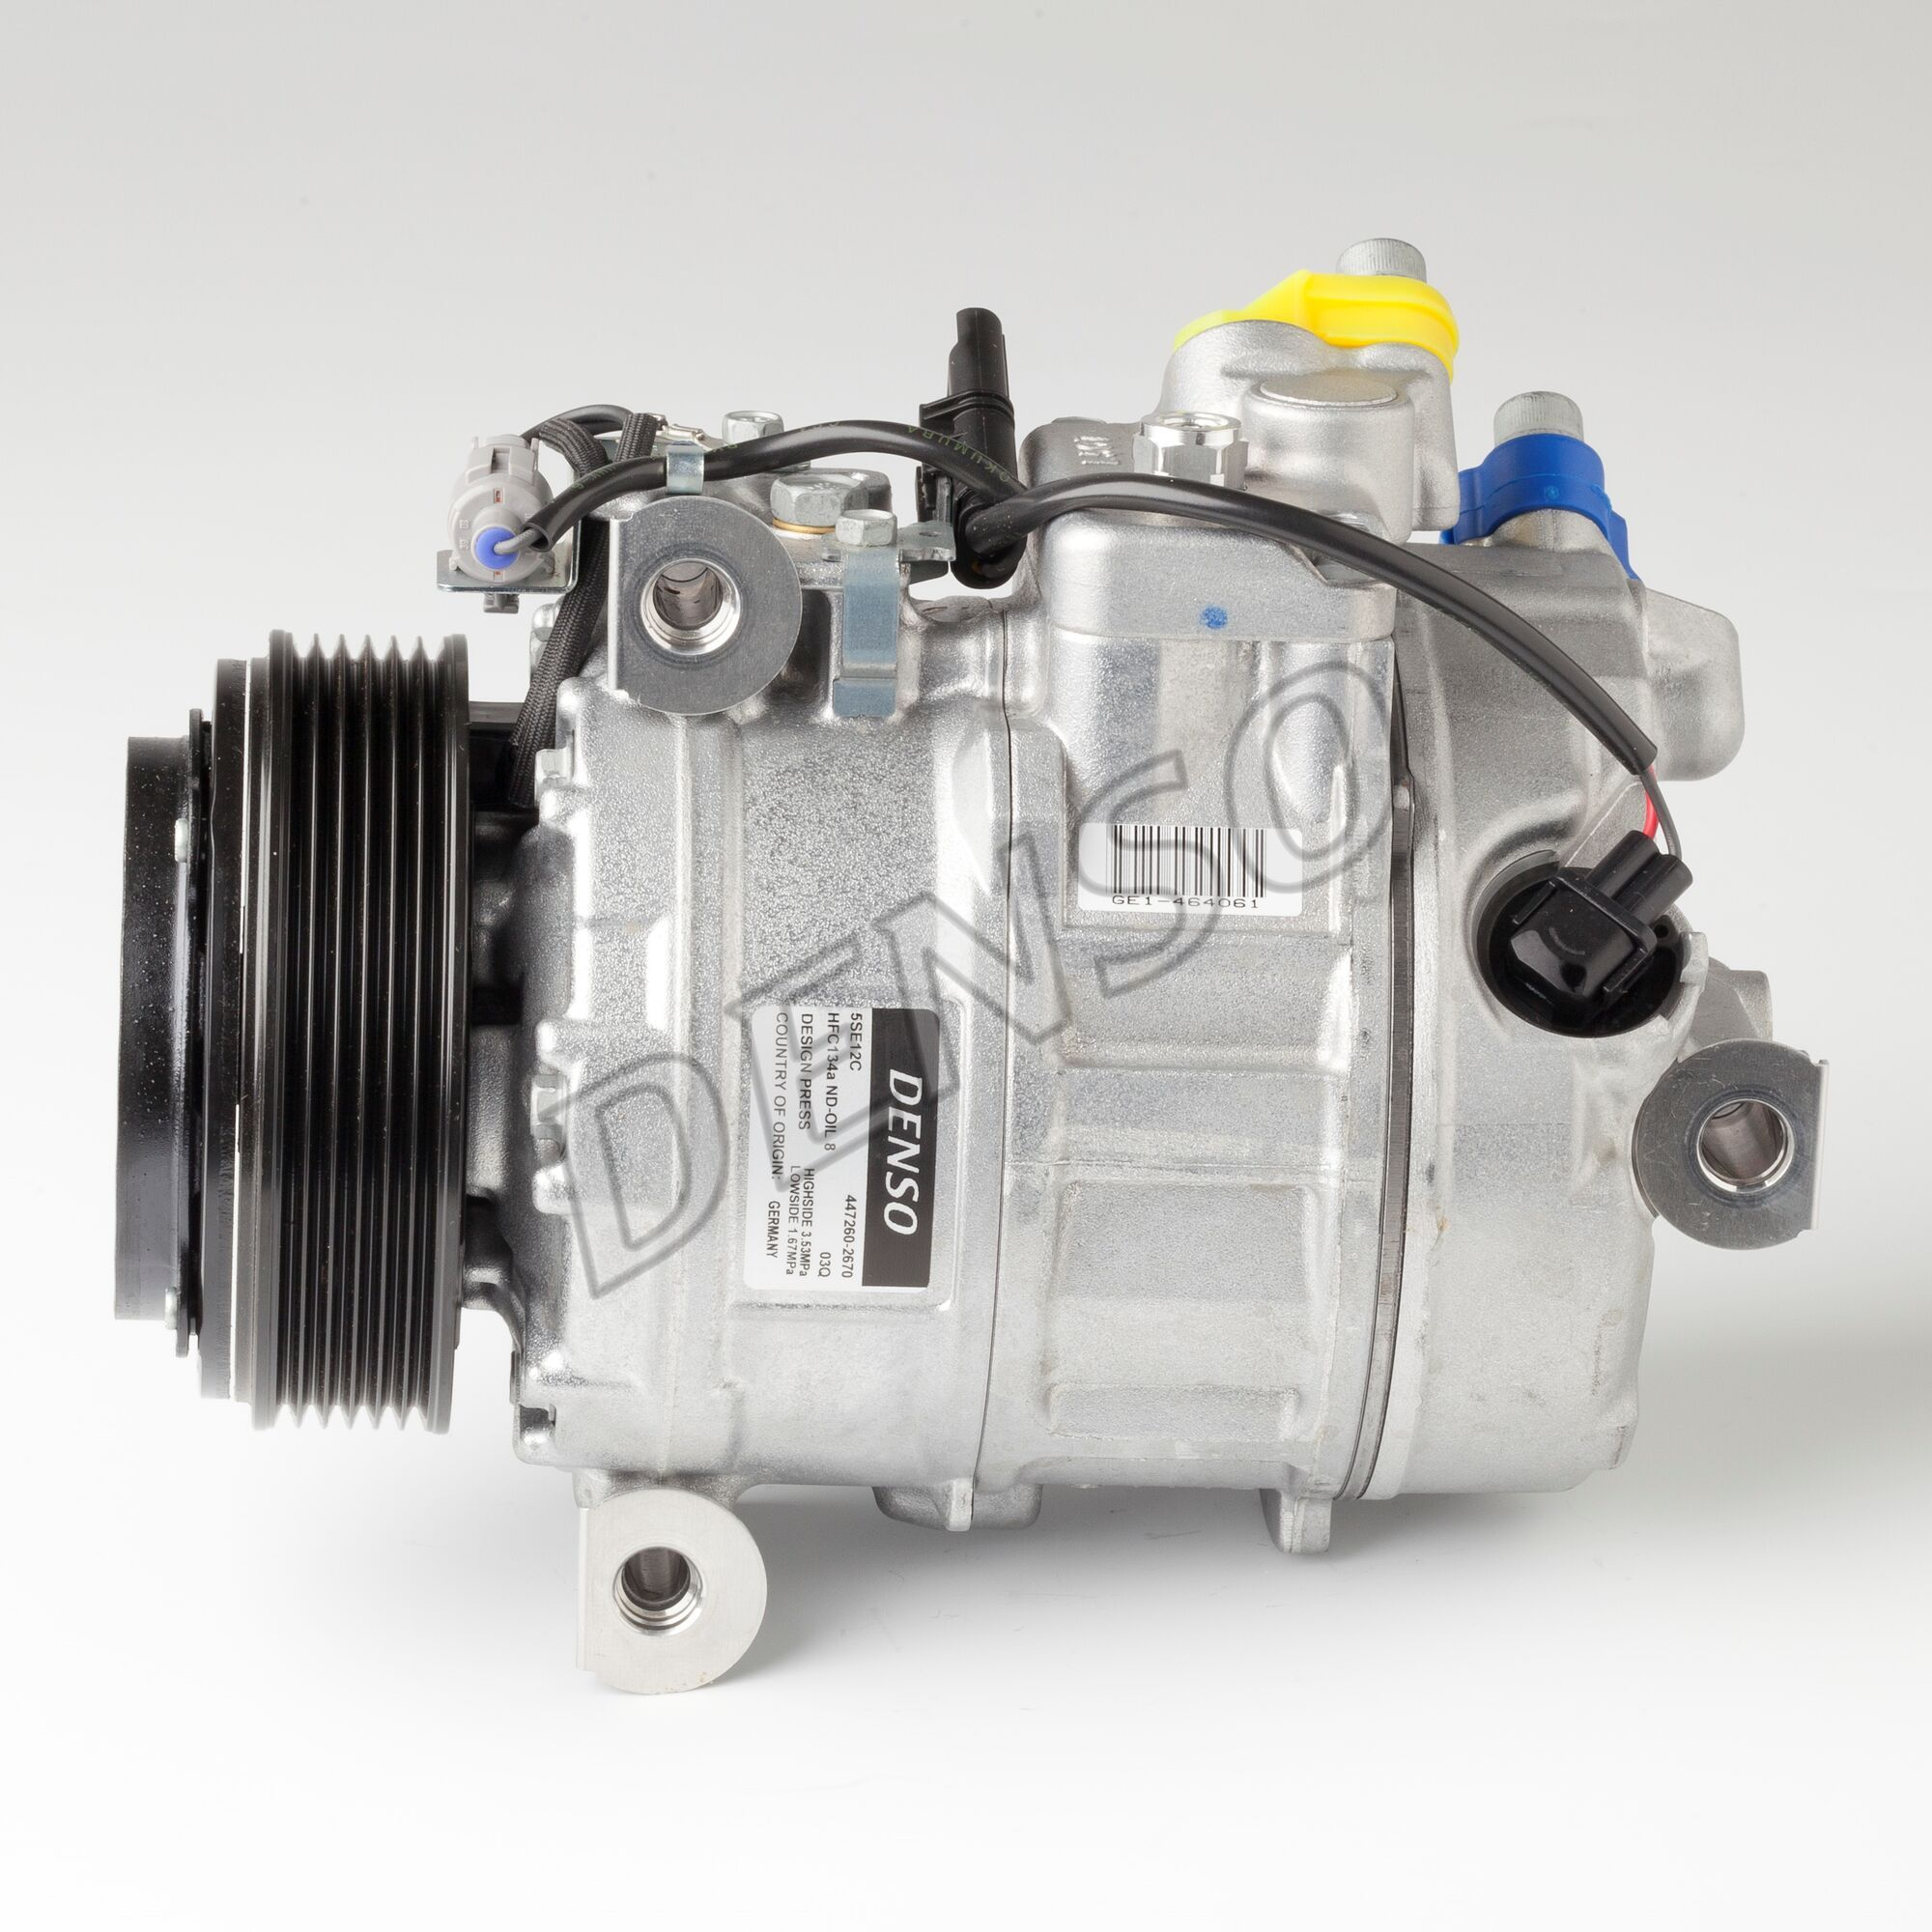 Kompressor Klimaanlage DENSO DCP05093